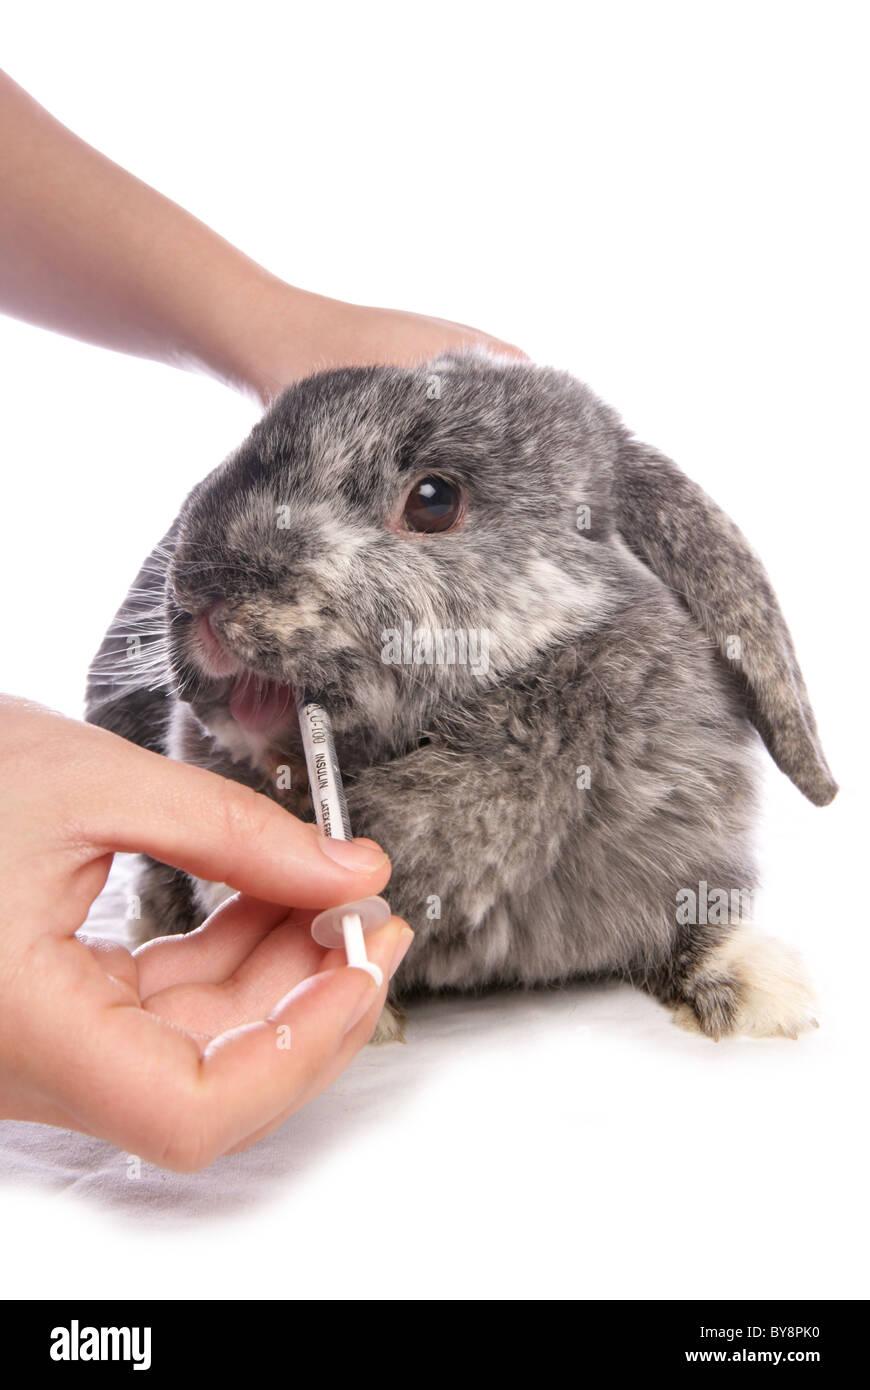 Domestic rabbit Owner giving medicine to single adult Studio, UK - Stock Image